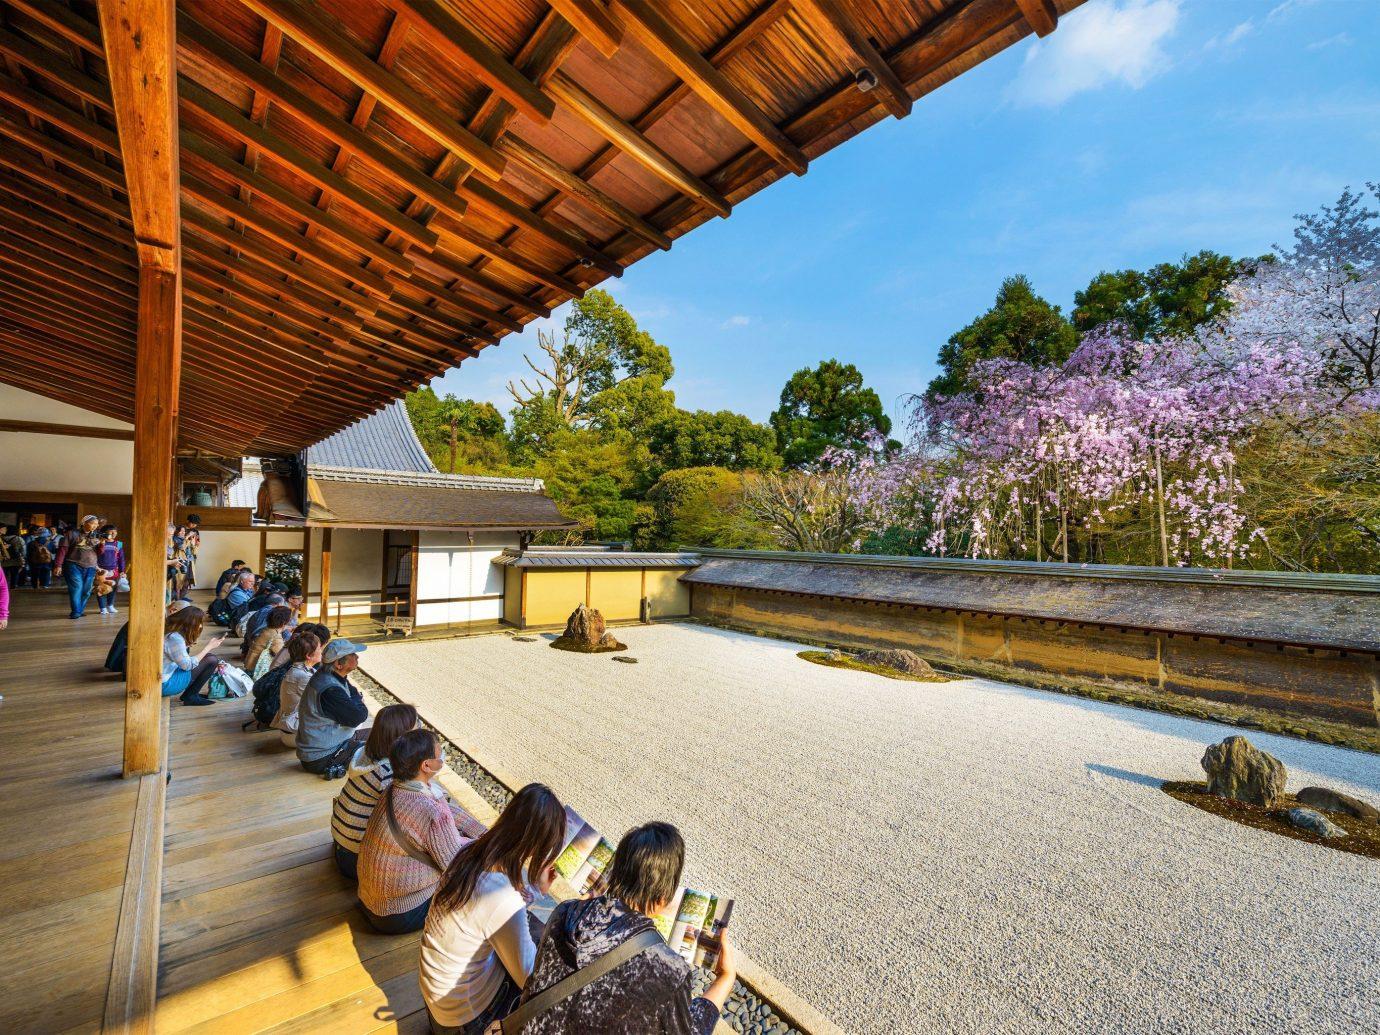 Trip Ideas outdoor leisure vacation estate tourism Resort walkway flower travel park